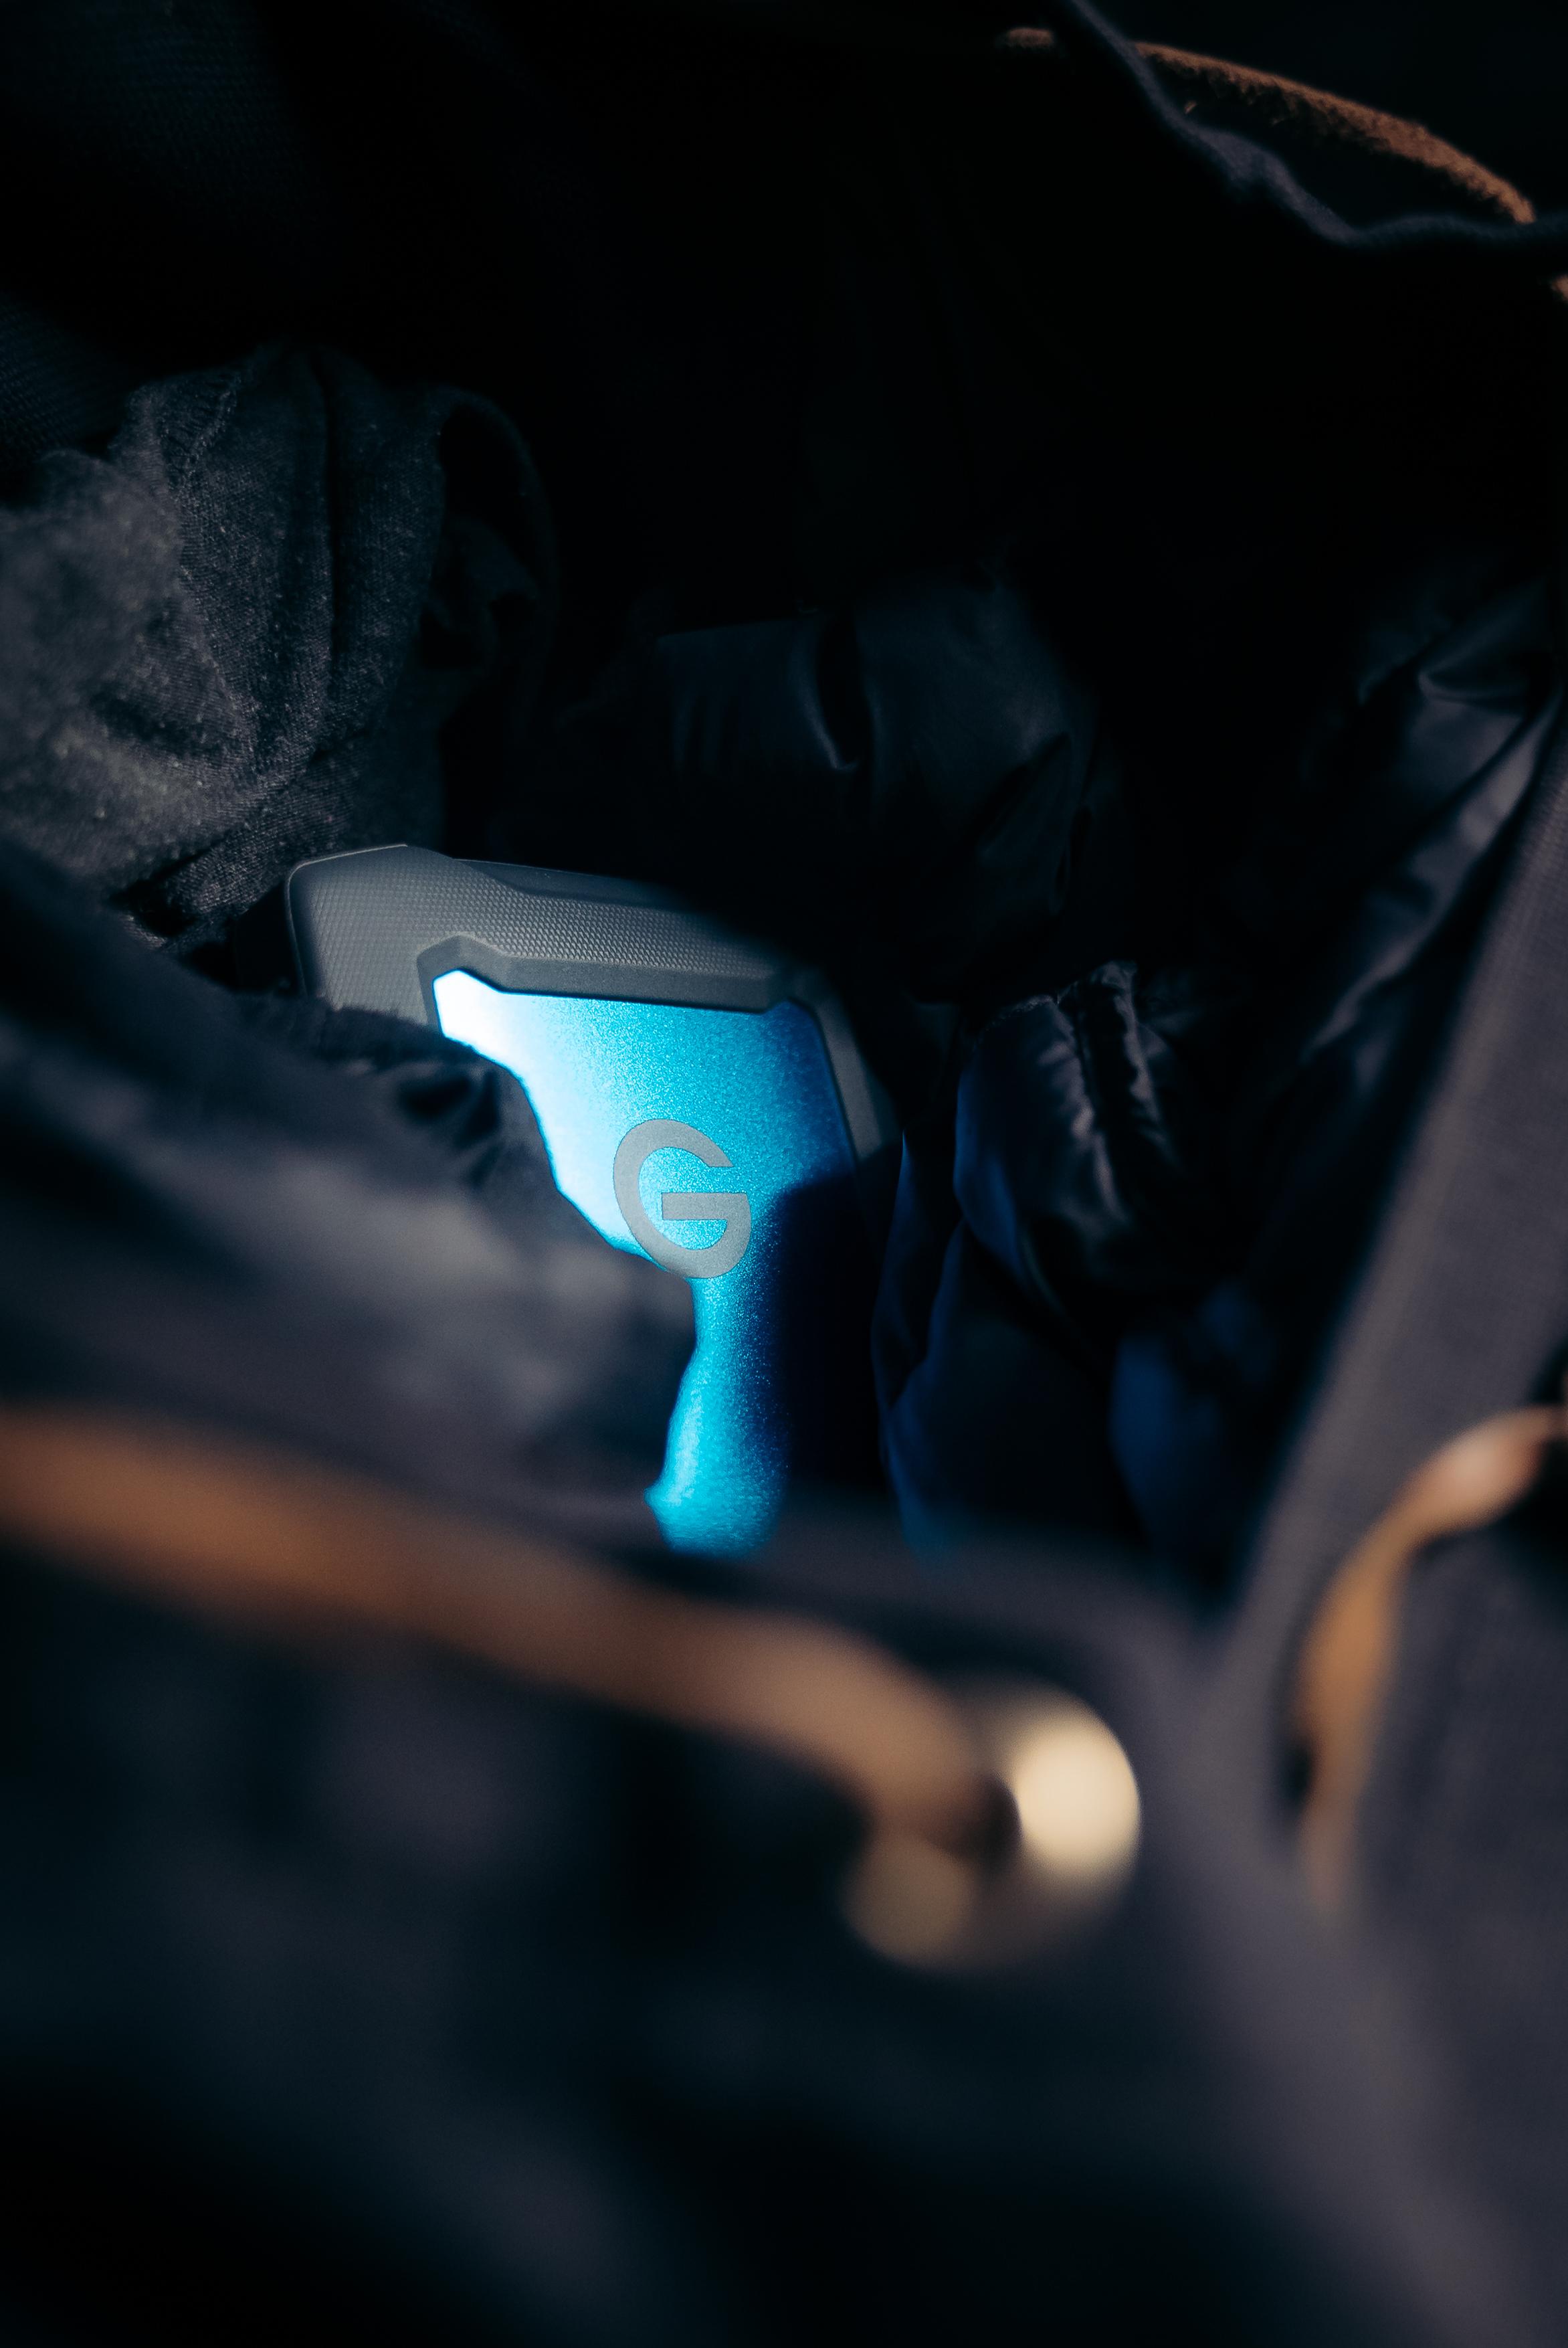 g-tech armor atd external hard drive in bag